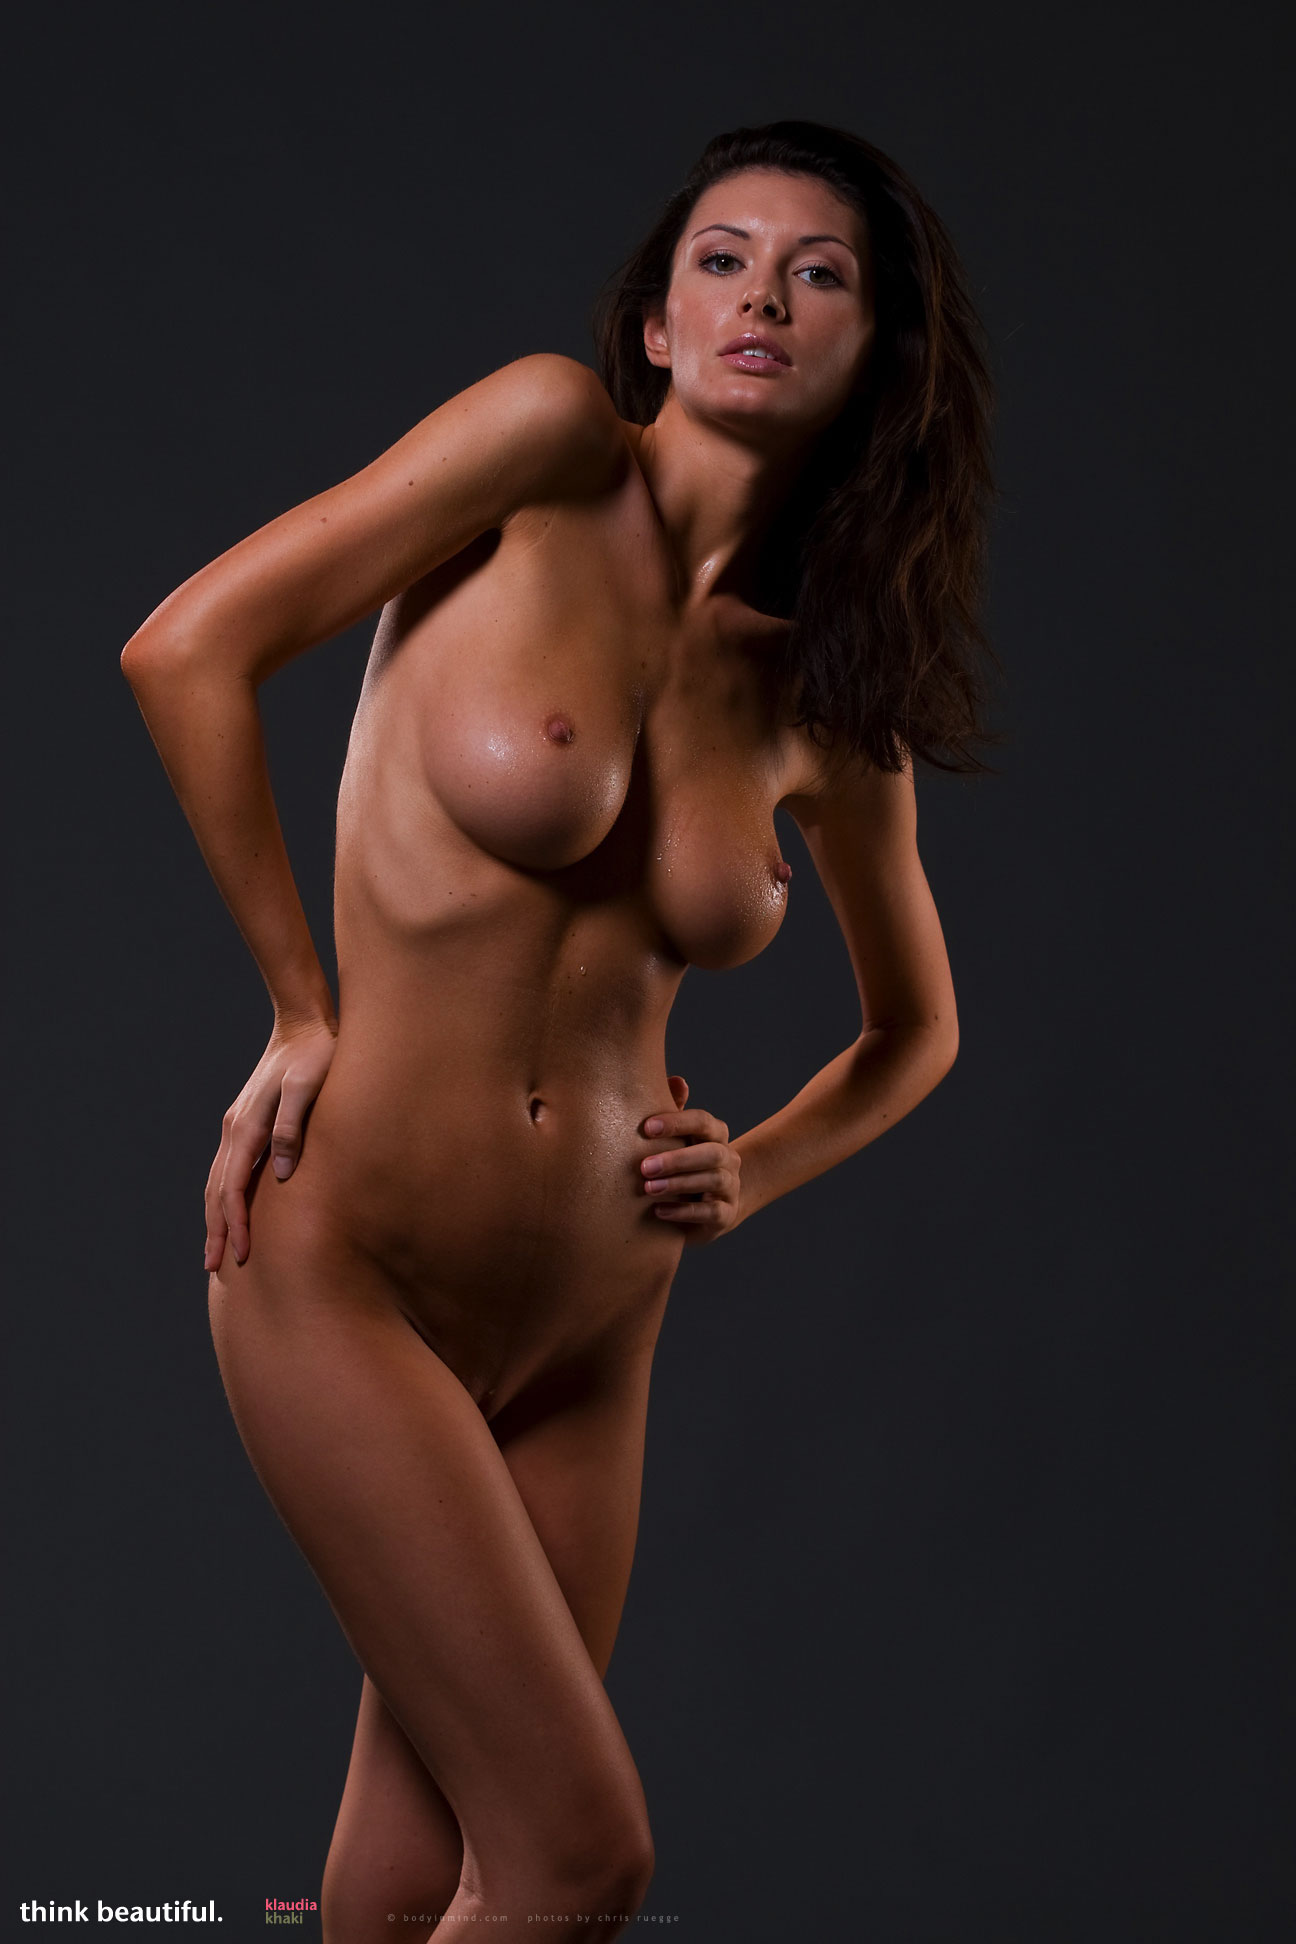 Fotos de Isabel serrano desnuda - famosasbiz